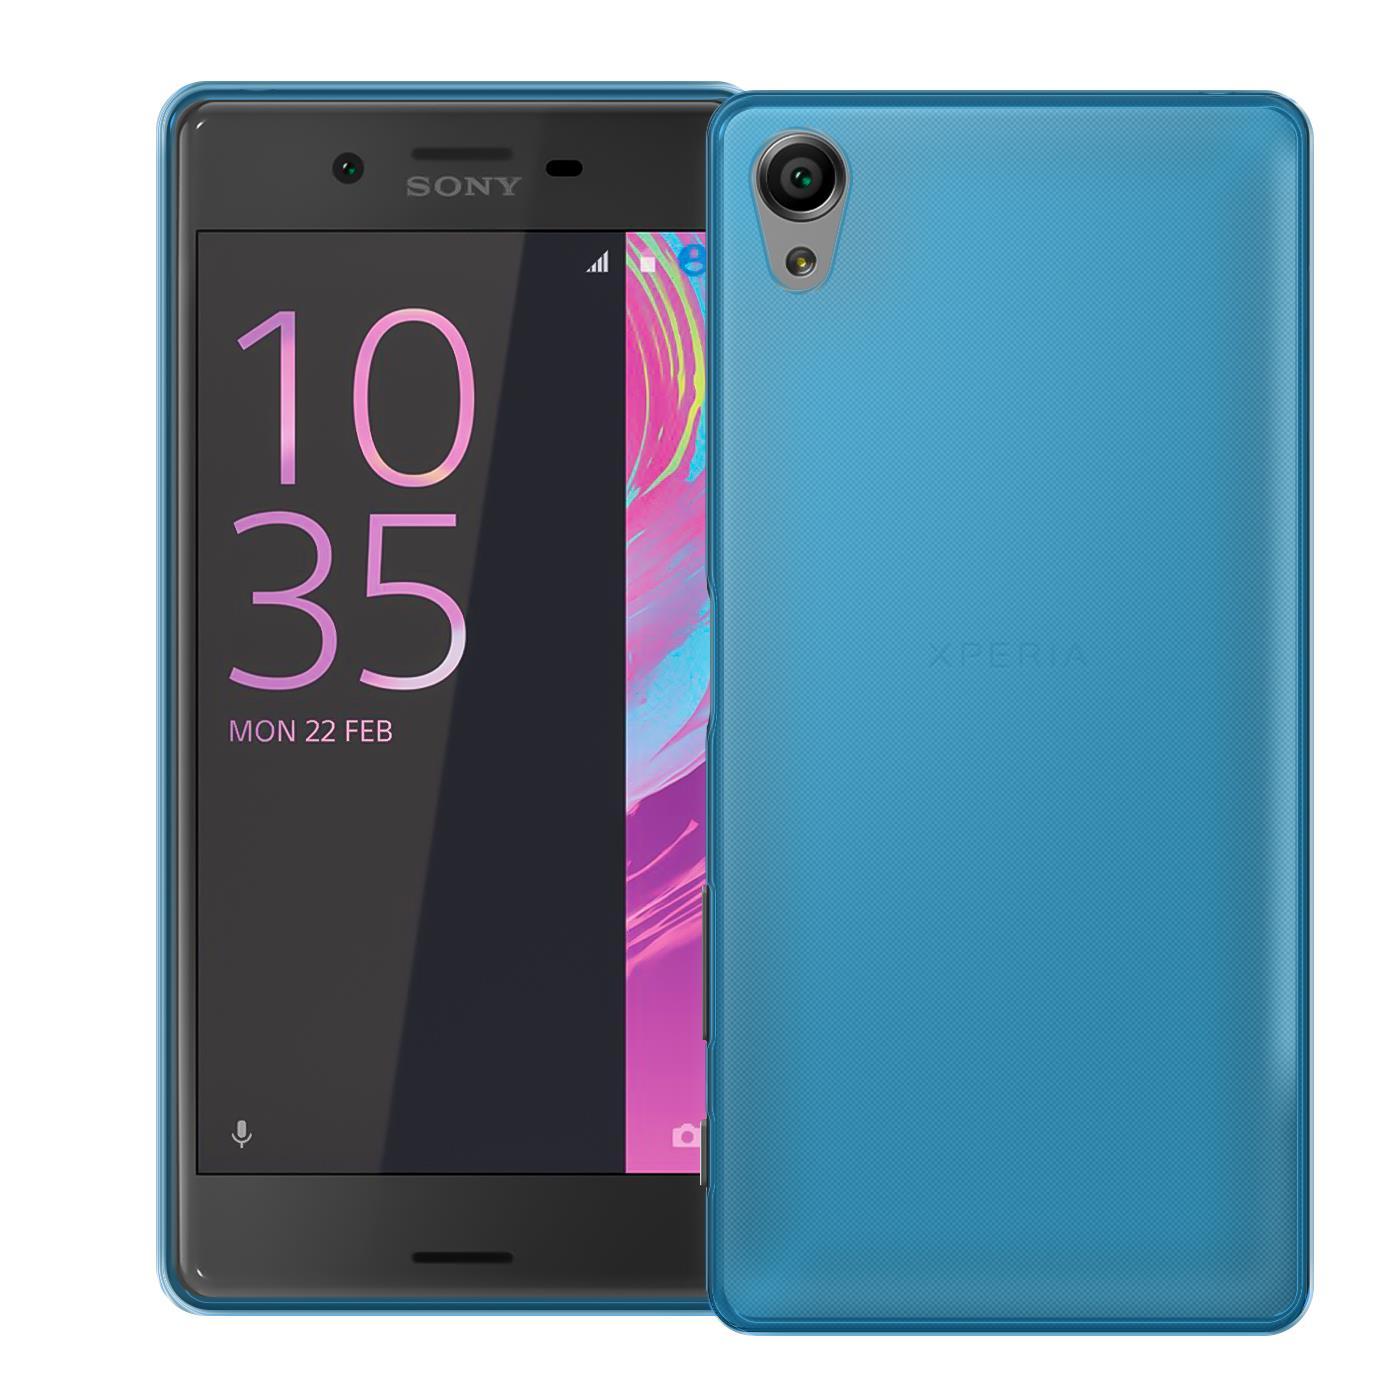 Ultra-Slim-Cover-fuer-Sony-Xperia-Huelle-Case-Silikon-Schutzhuelle-Bumper-Tasche